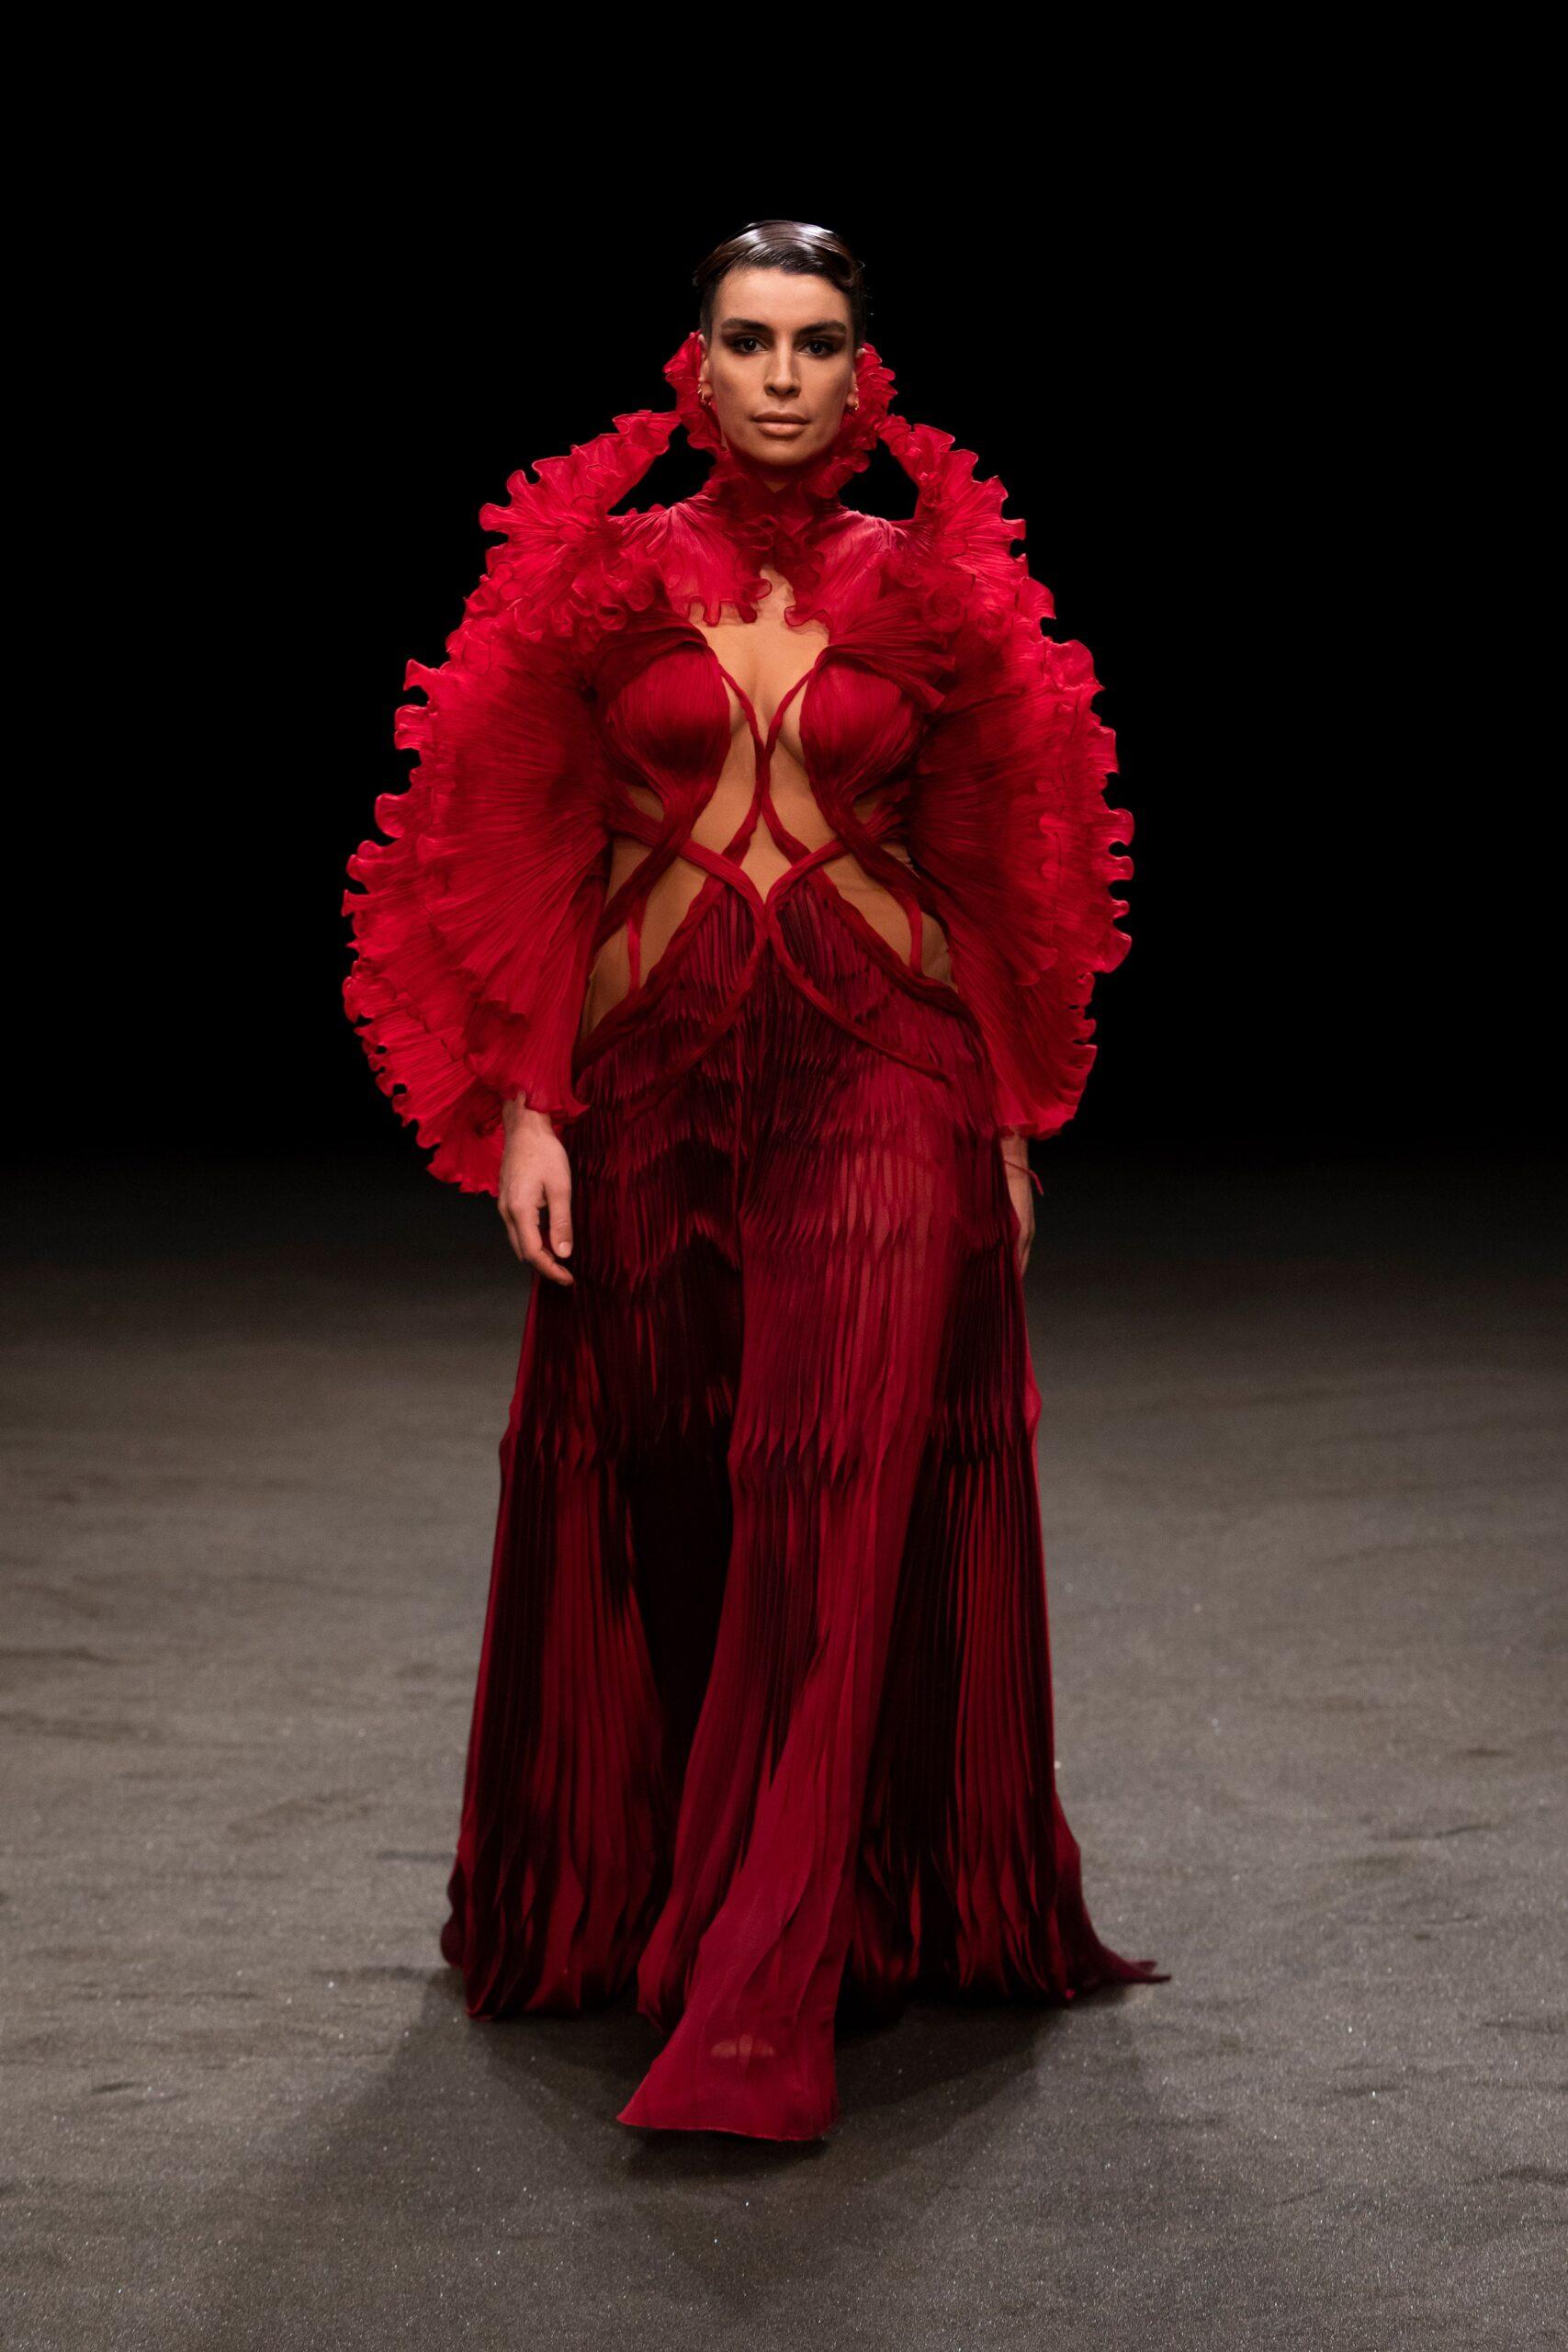 00013 Iris van Herpen Couture Spring 21 credit Gio Staiano